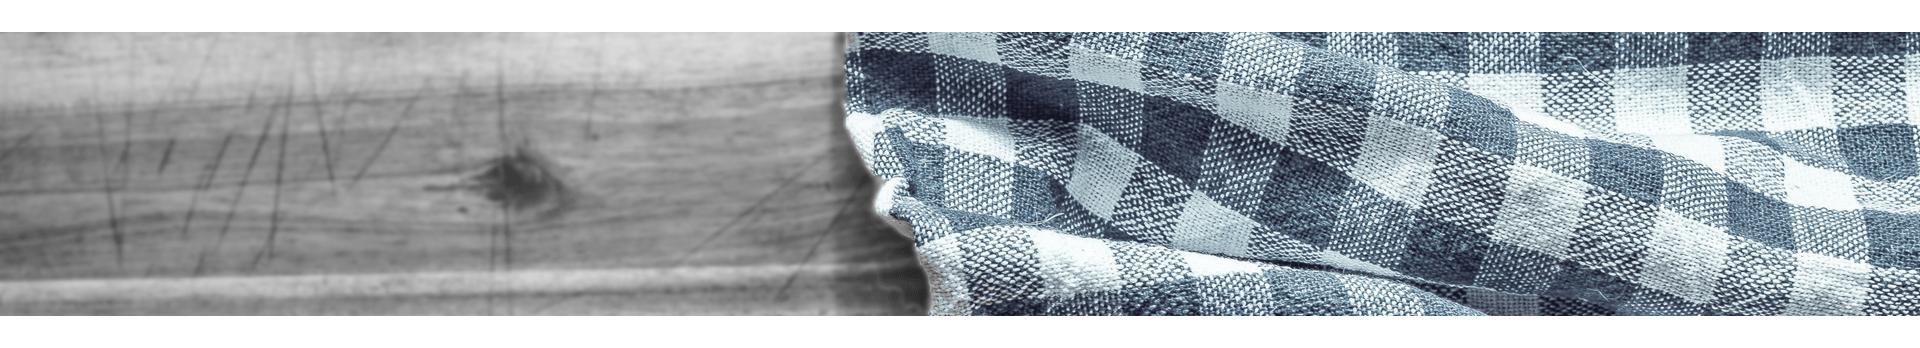 Mantelerias | Manteles de Tela para Mesa | Mobelfy ®